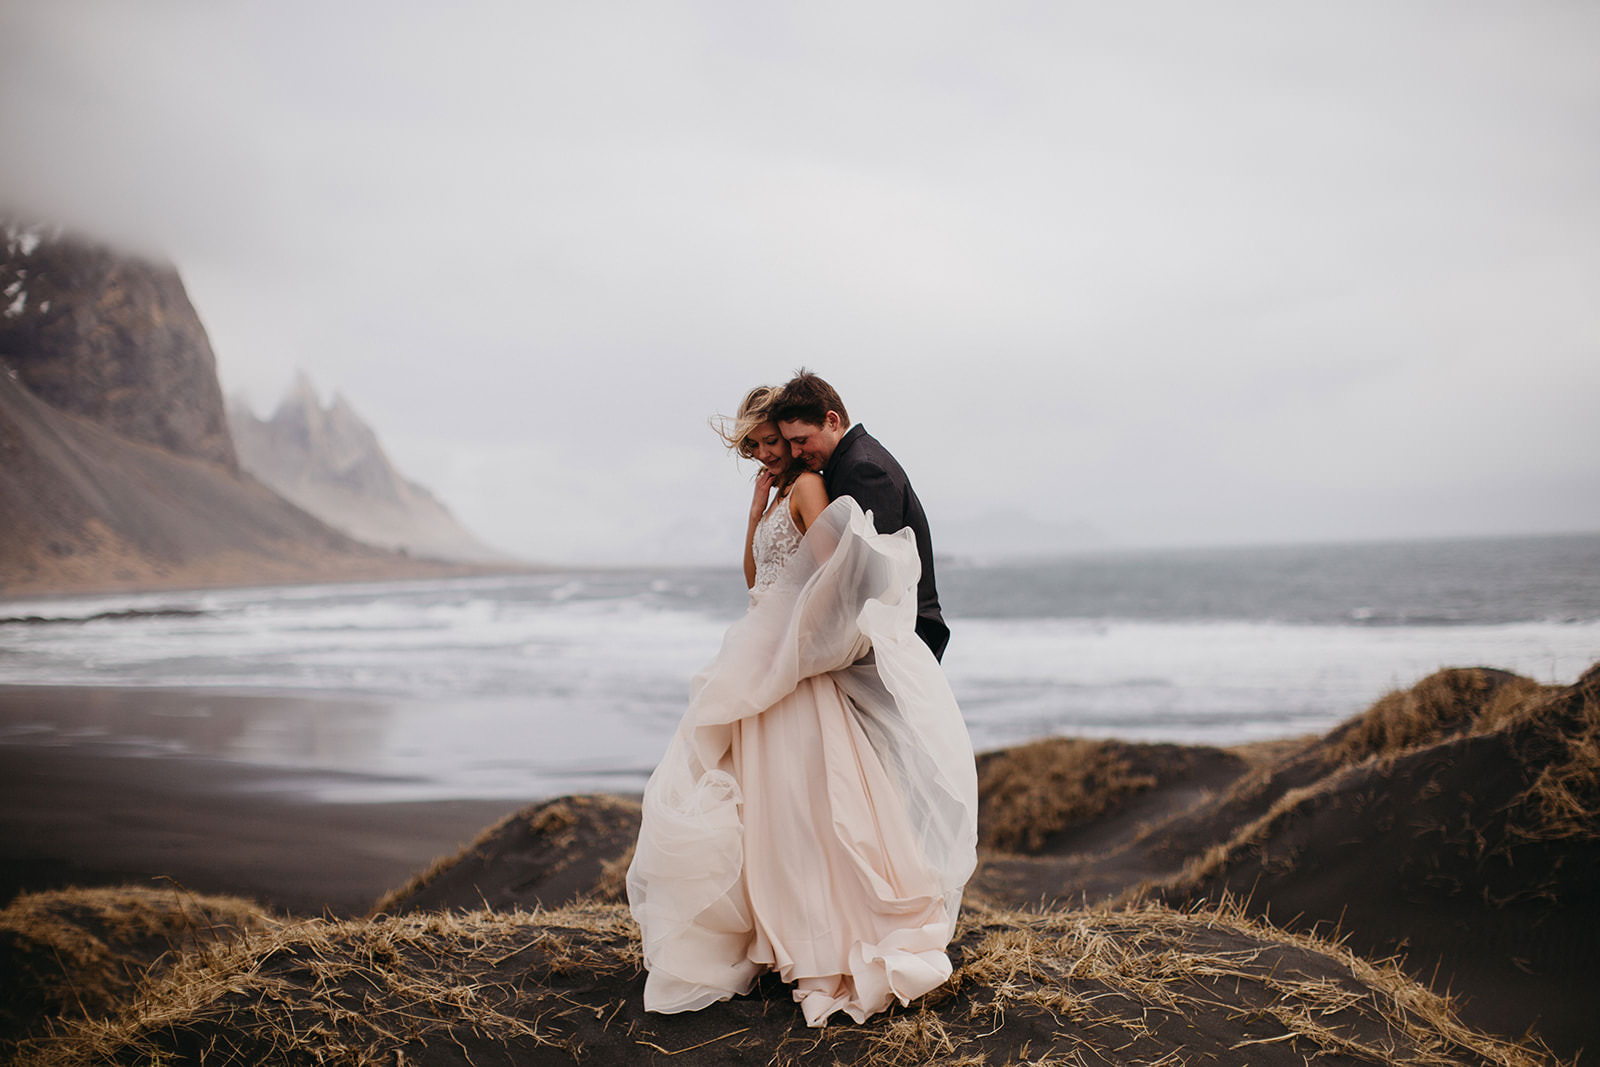 Icelandic Iceland Elopement Wedding Elope Photographer Eloping Reykjavík Vik Black Sand Beach Jökulsárlón Skogafoss Waterfall Vestrahorn Mountain Liz Osban Photography Destination 34.jpg